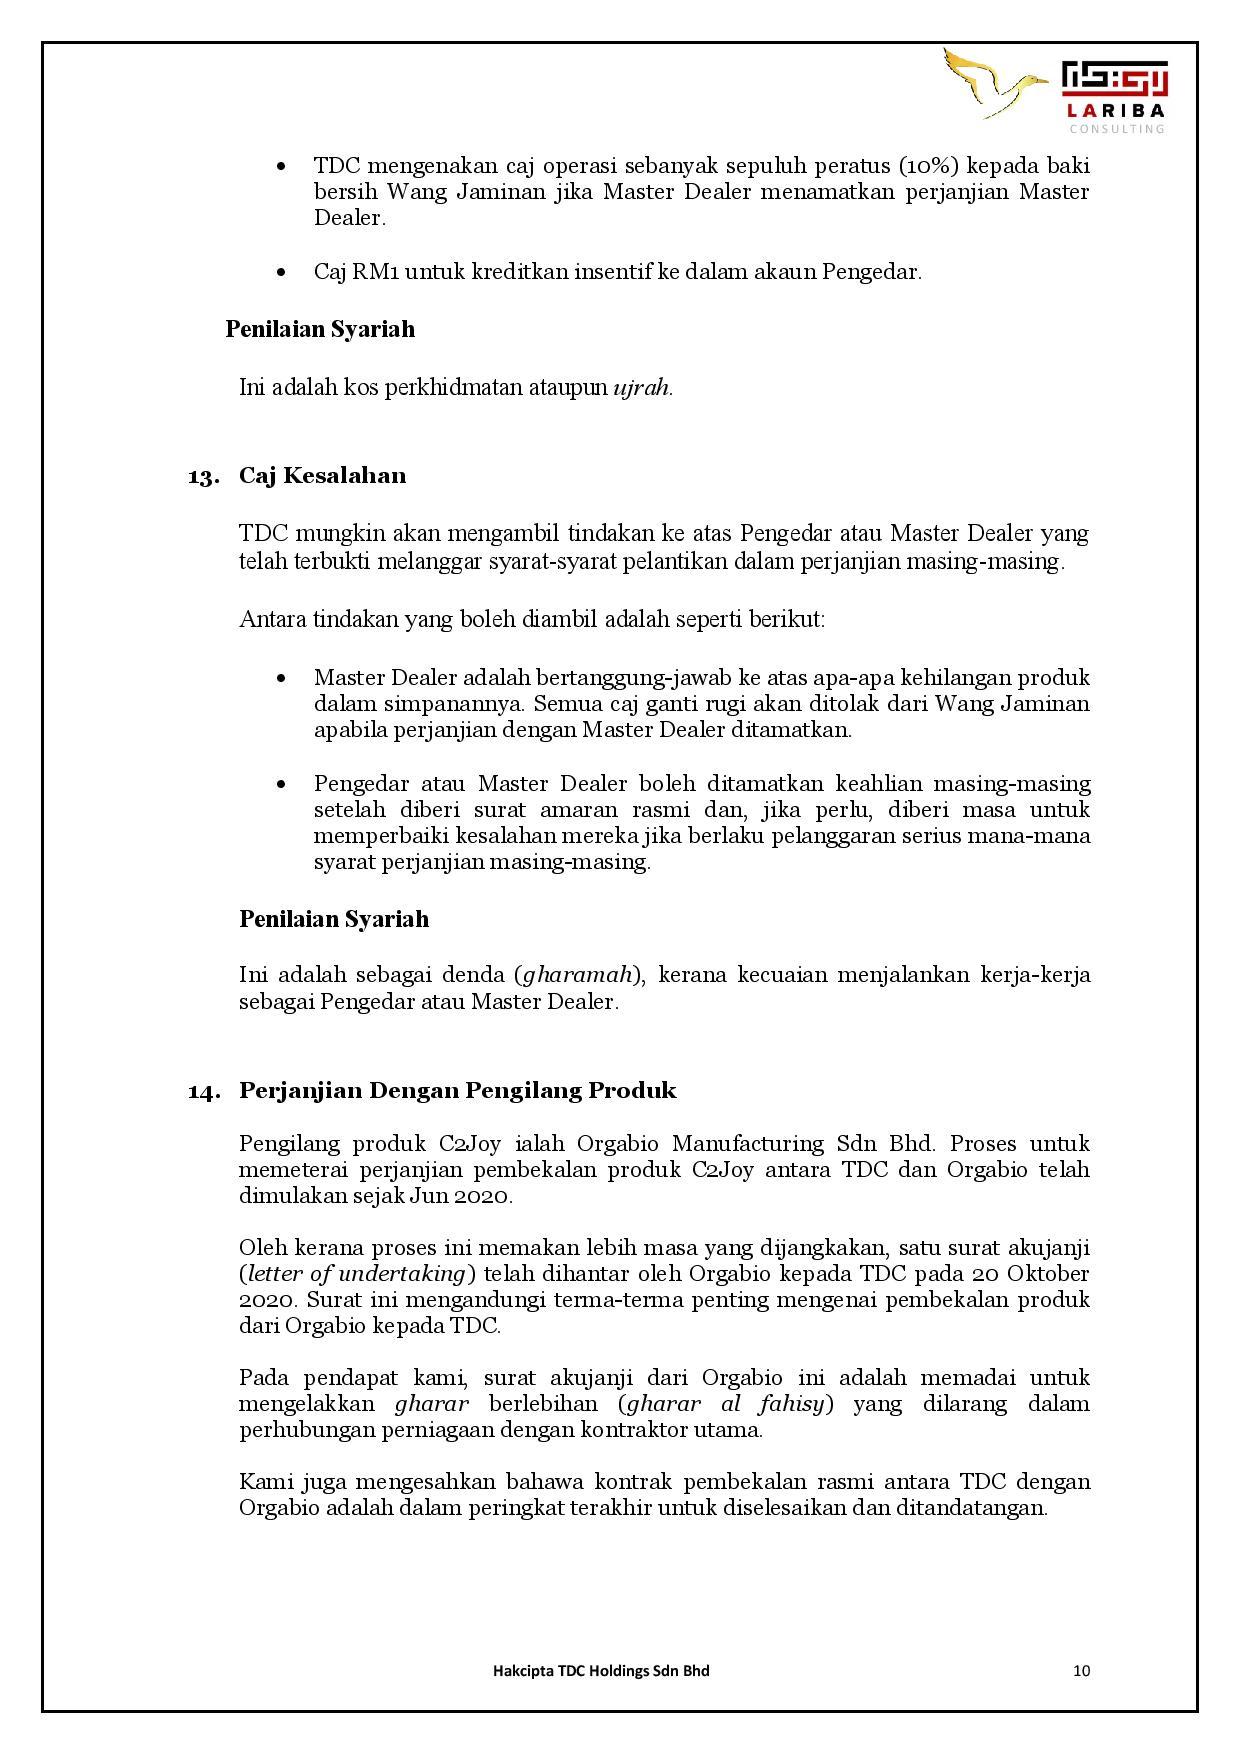 Huraian Penilaian Syariah TDC 210121 (1)-page-010